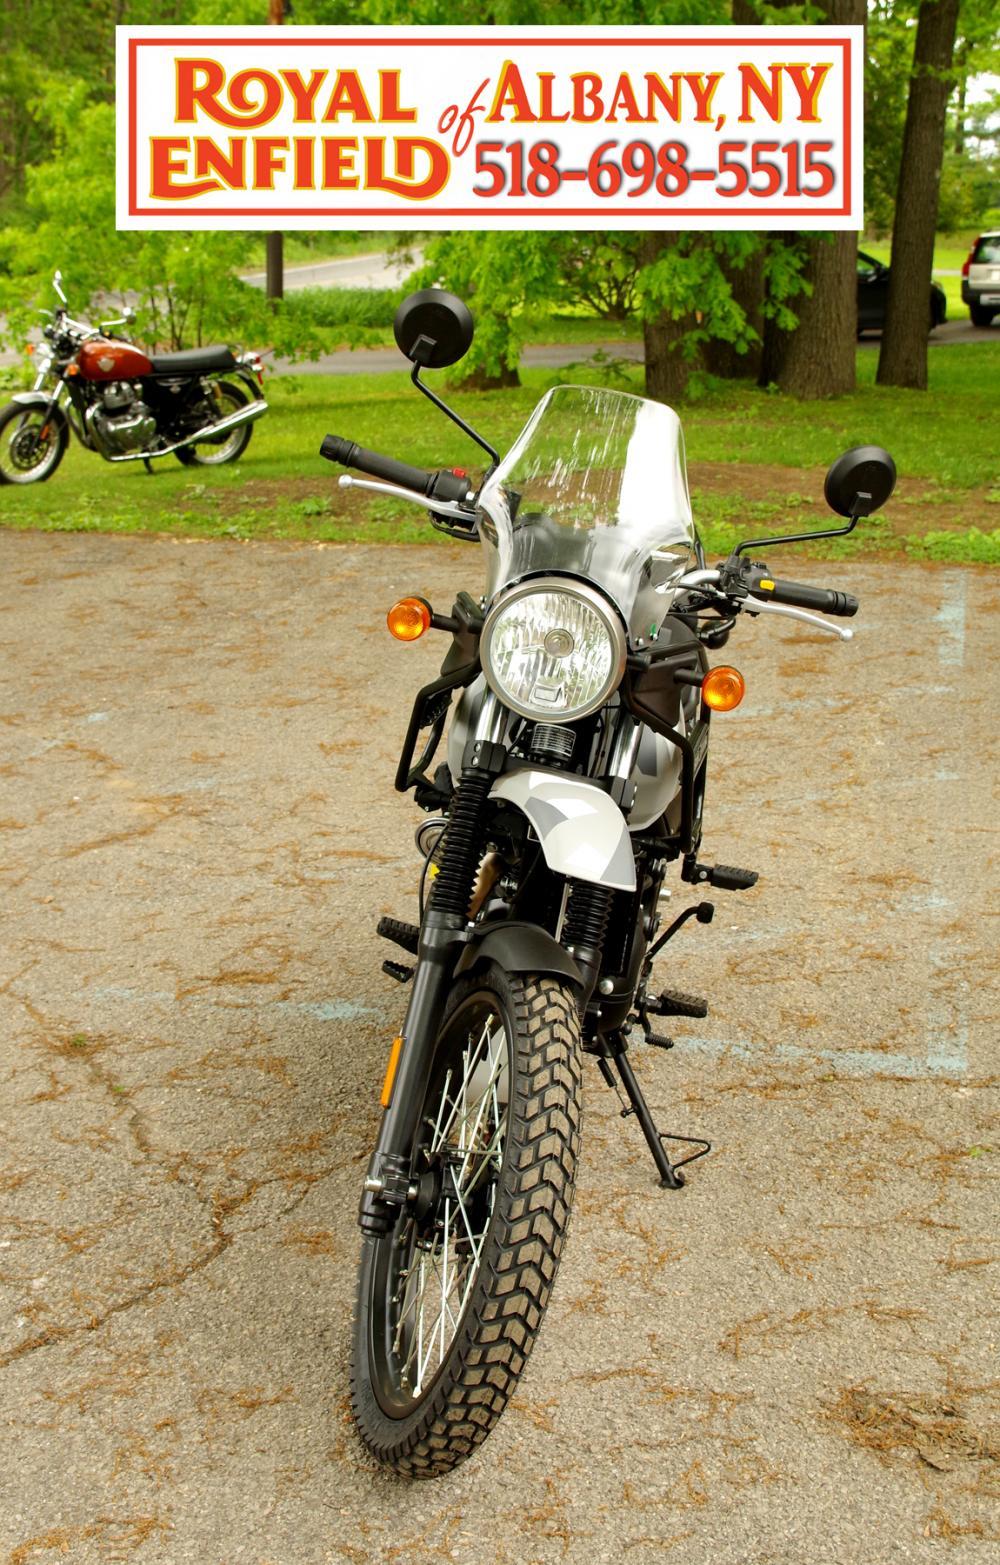 Royal Enfield Of Albany New York Royal Enfield Motorcycles